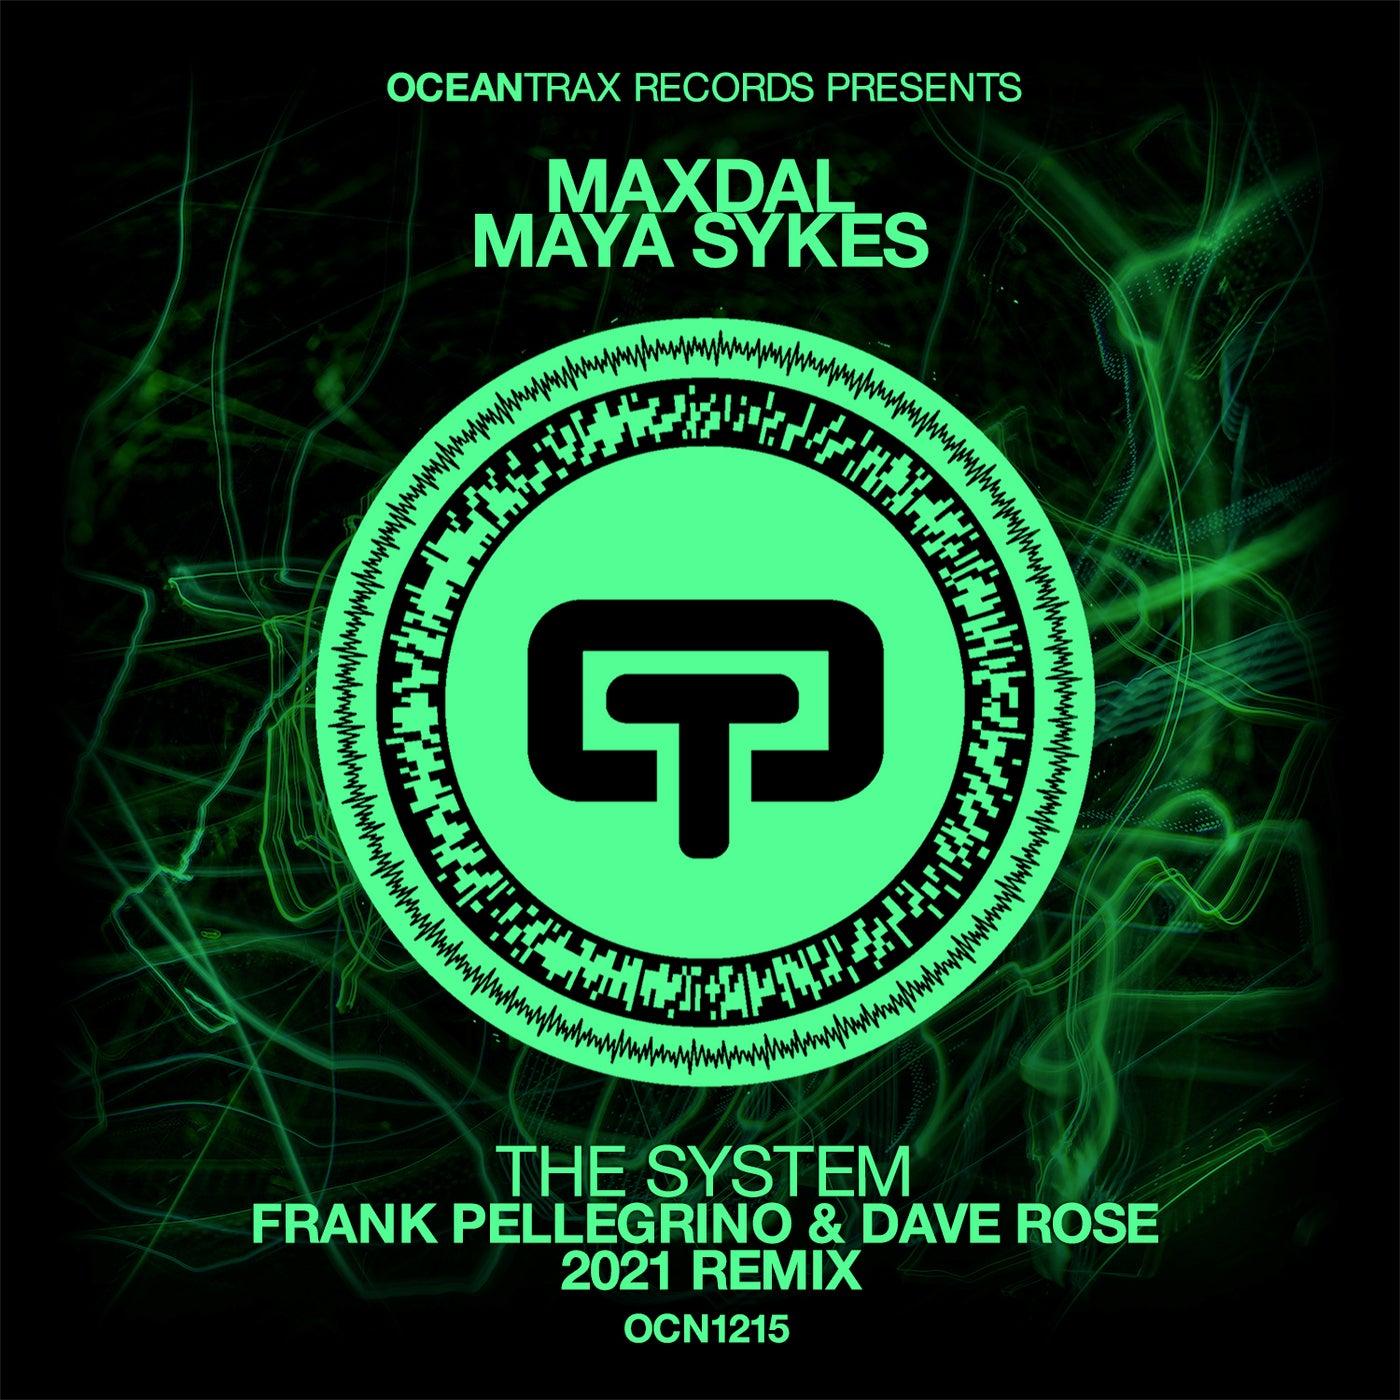 The System (Frank Pellegrino & Dave Rose 2021 Remix)